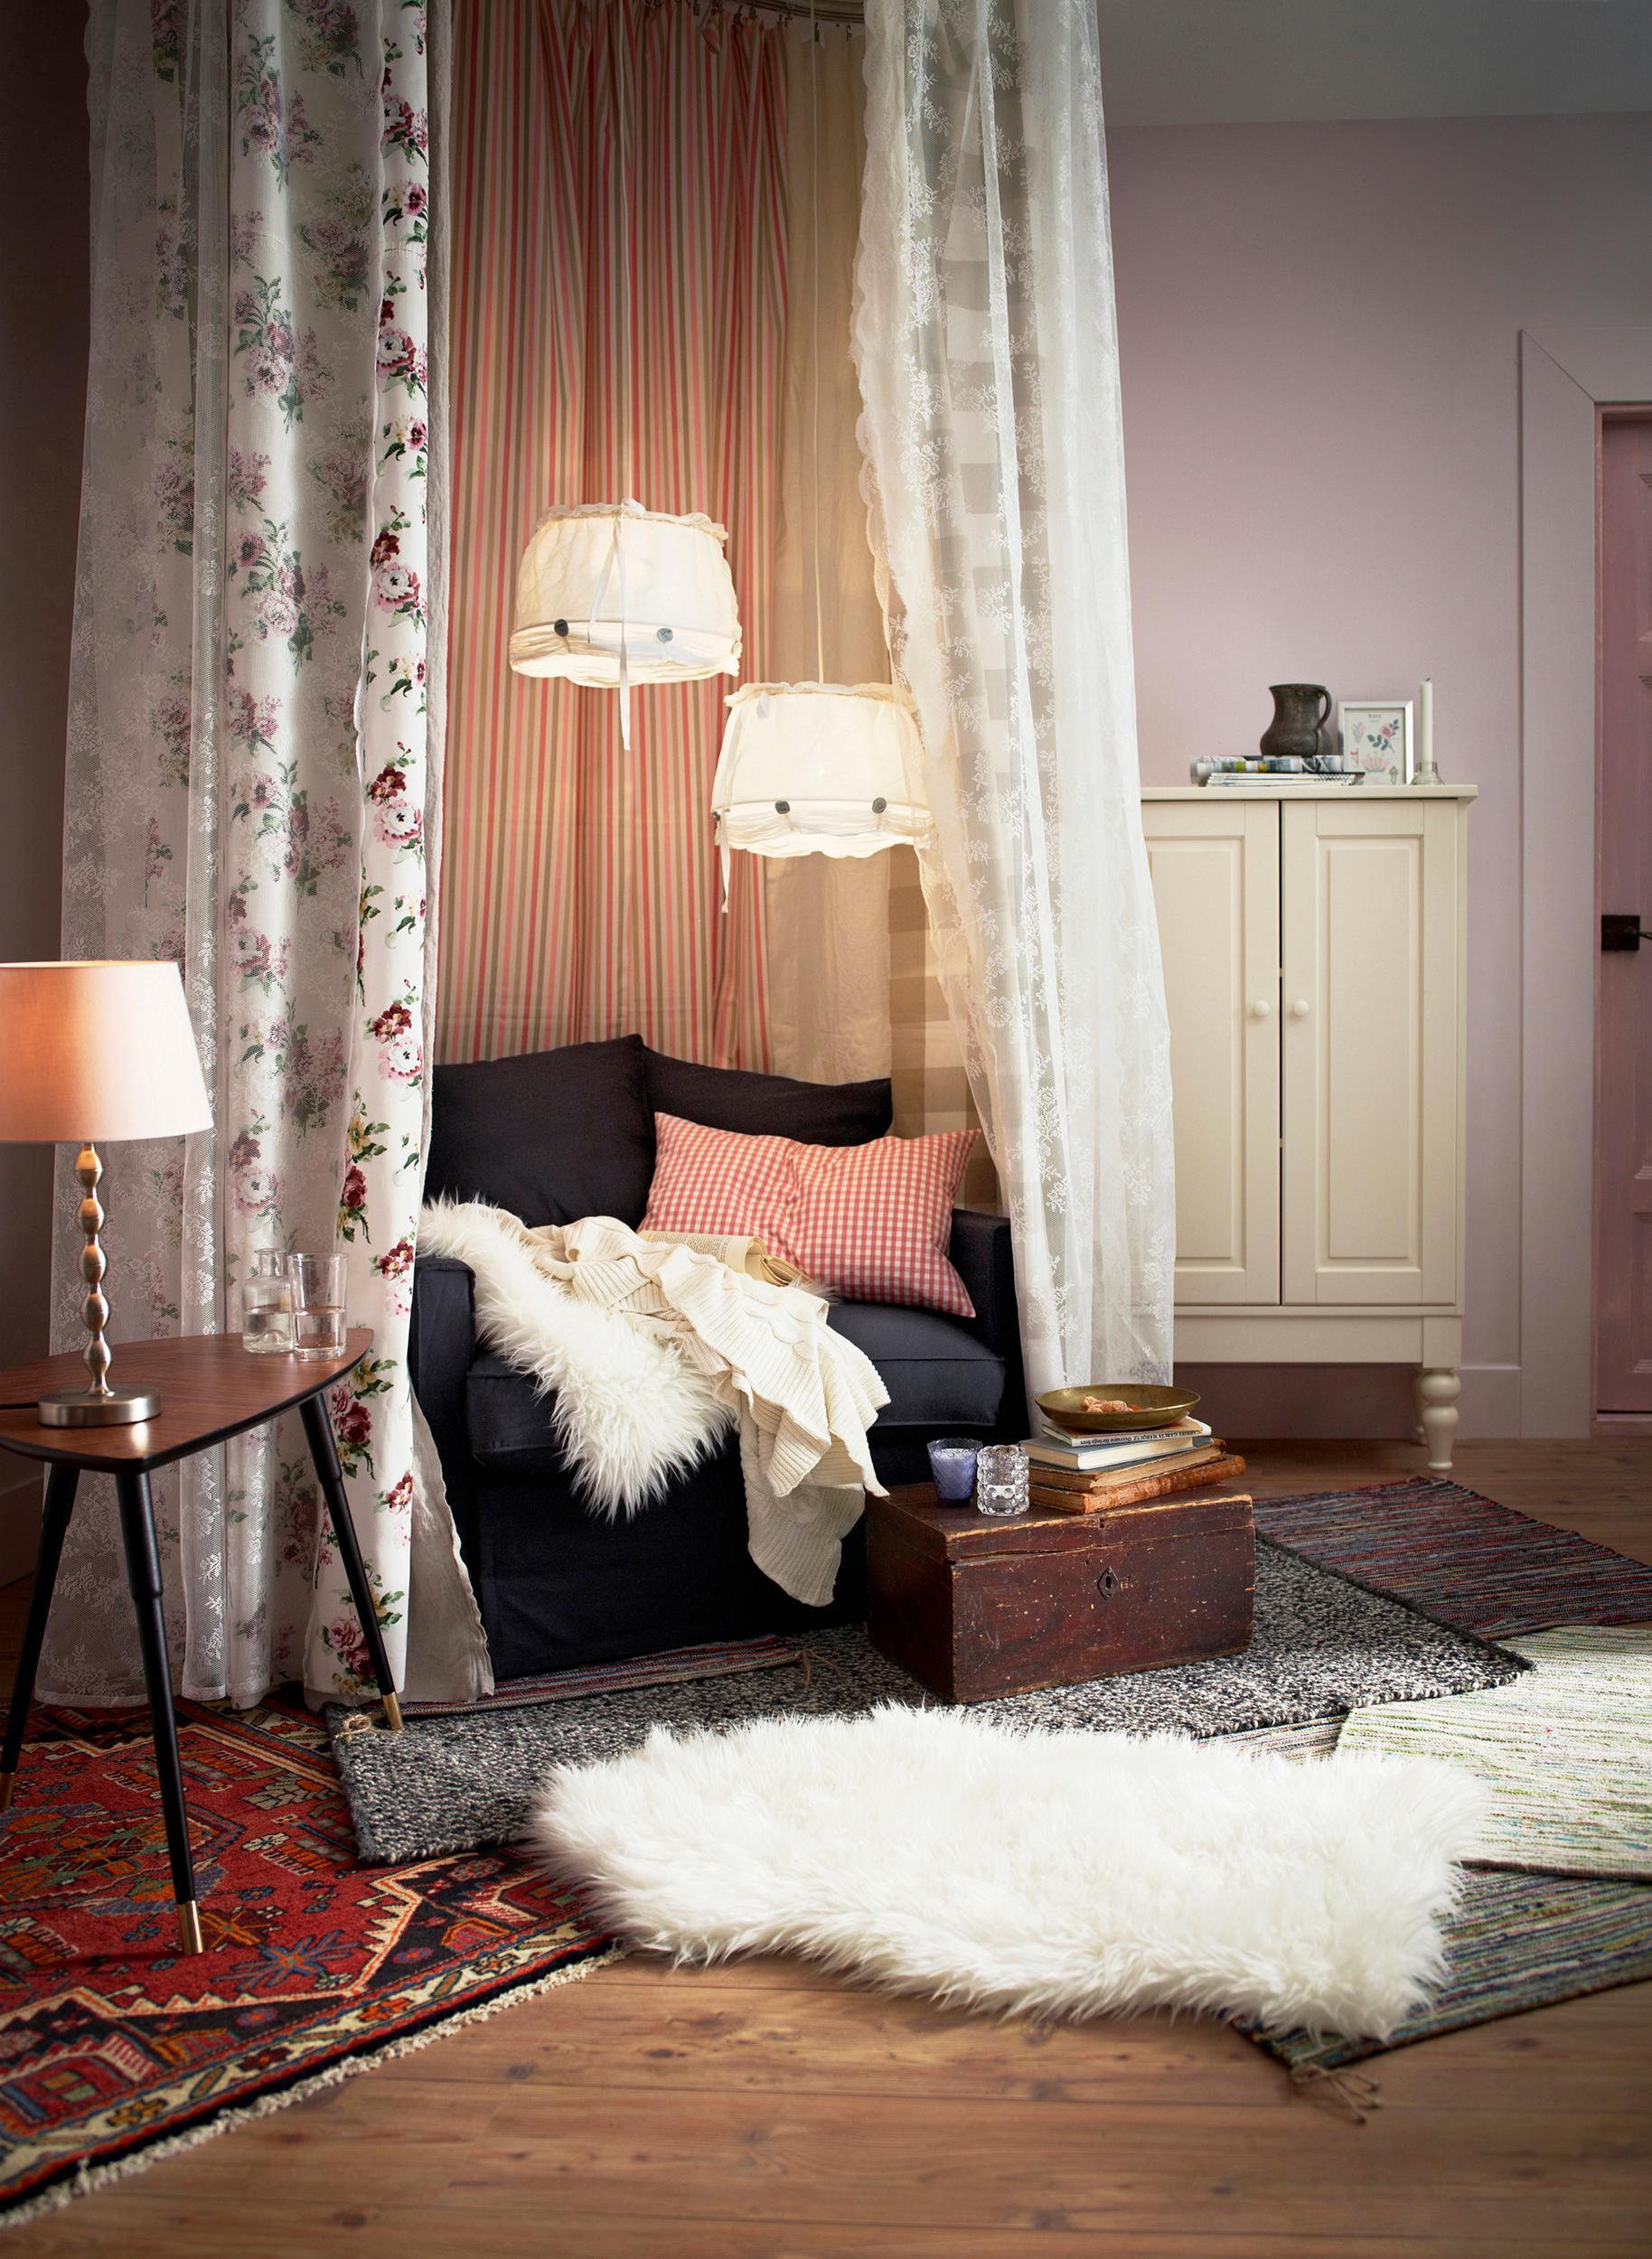 Himmelbett holz ikea  Ikea • Bilder & Ideen • COUCHstyle